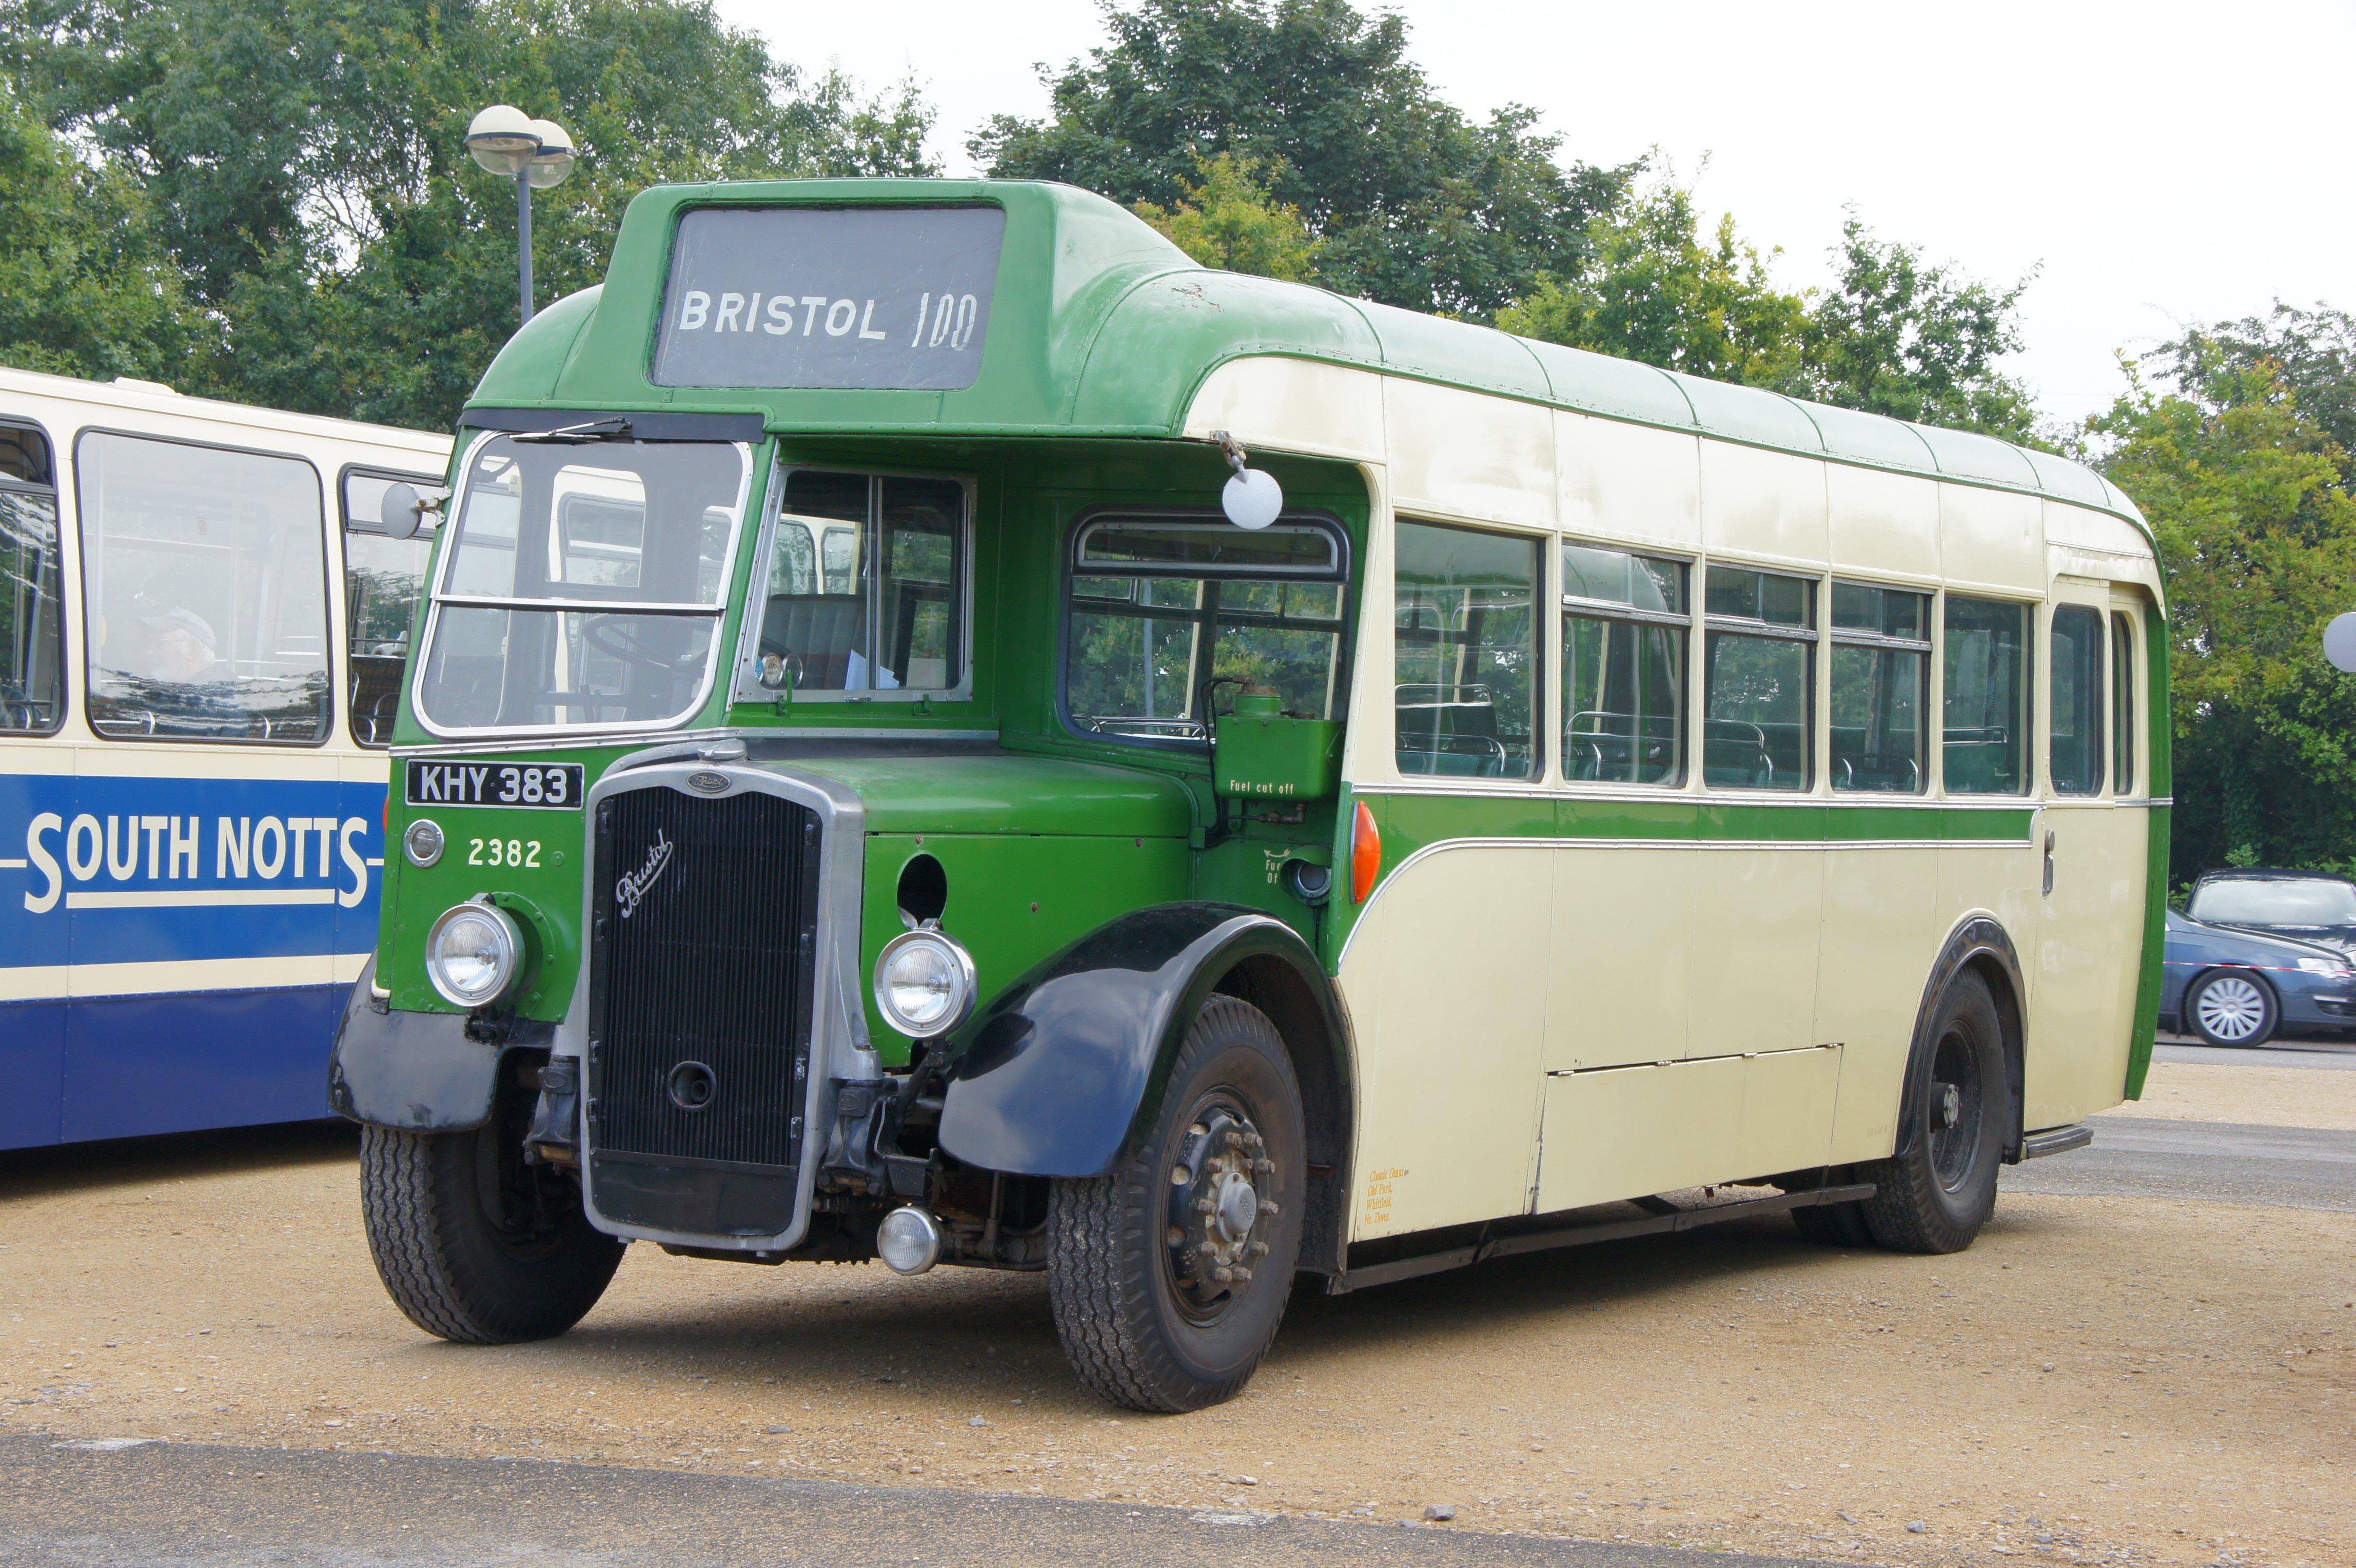 File:Bristol Omnibus bus 2382 (KHY 383), 2012 Bristol Vintage Bus Group